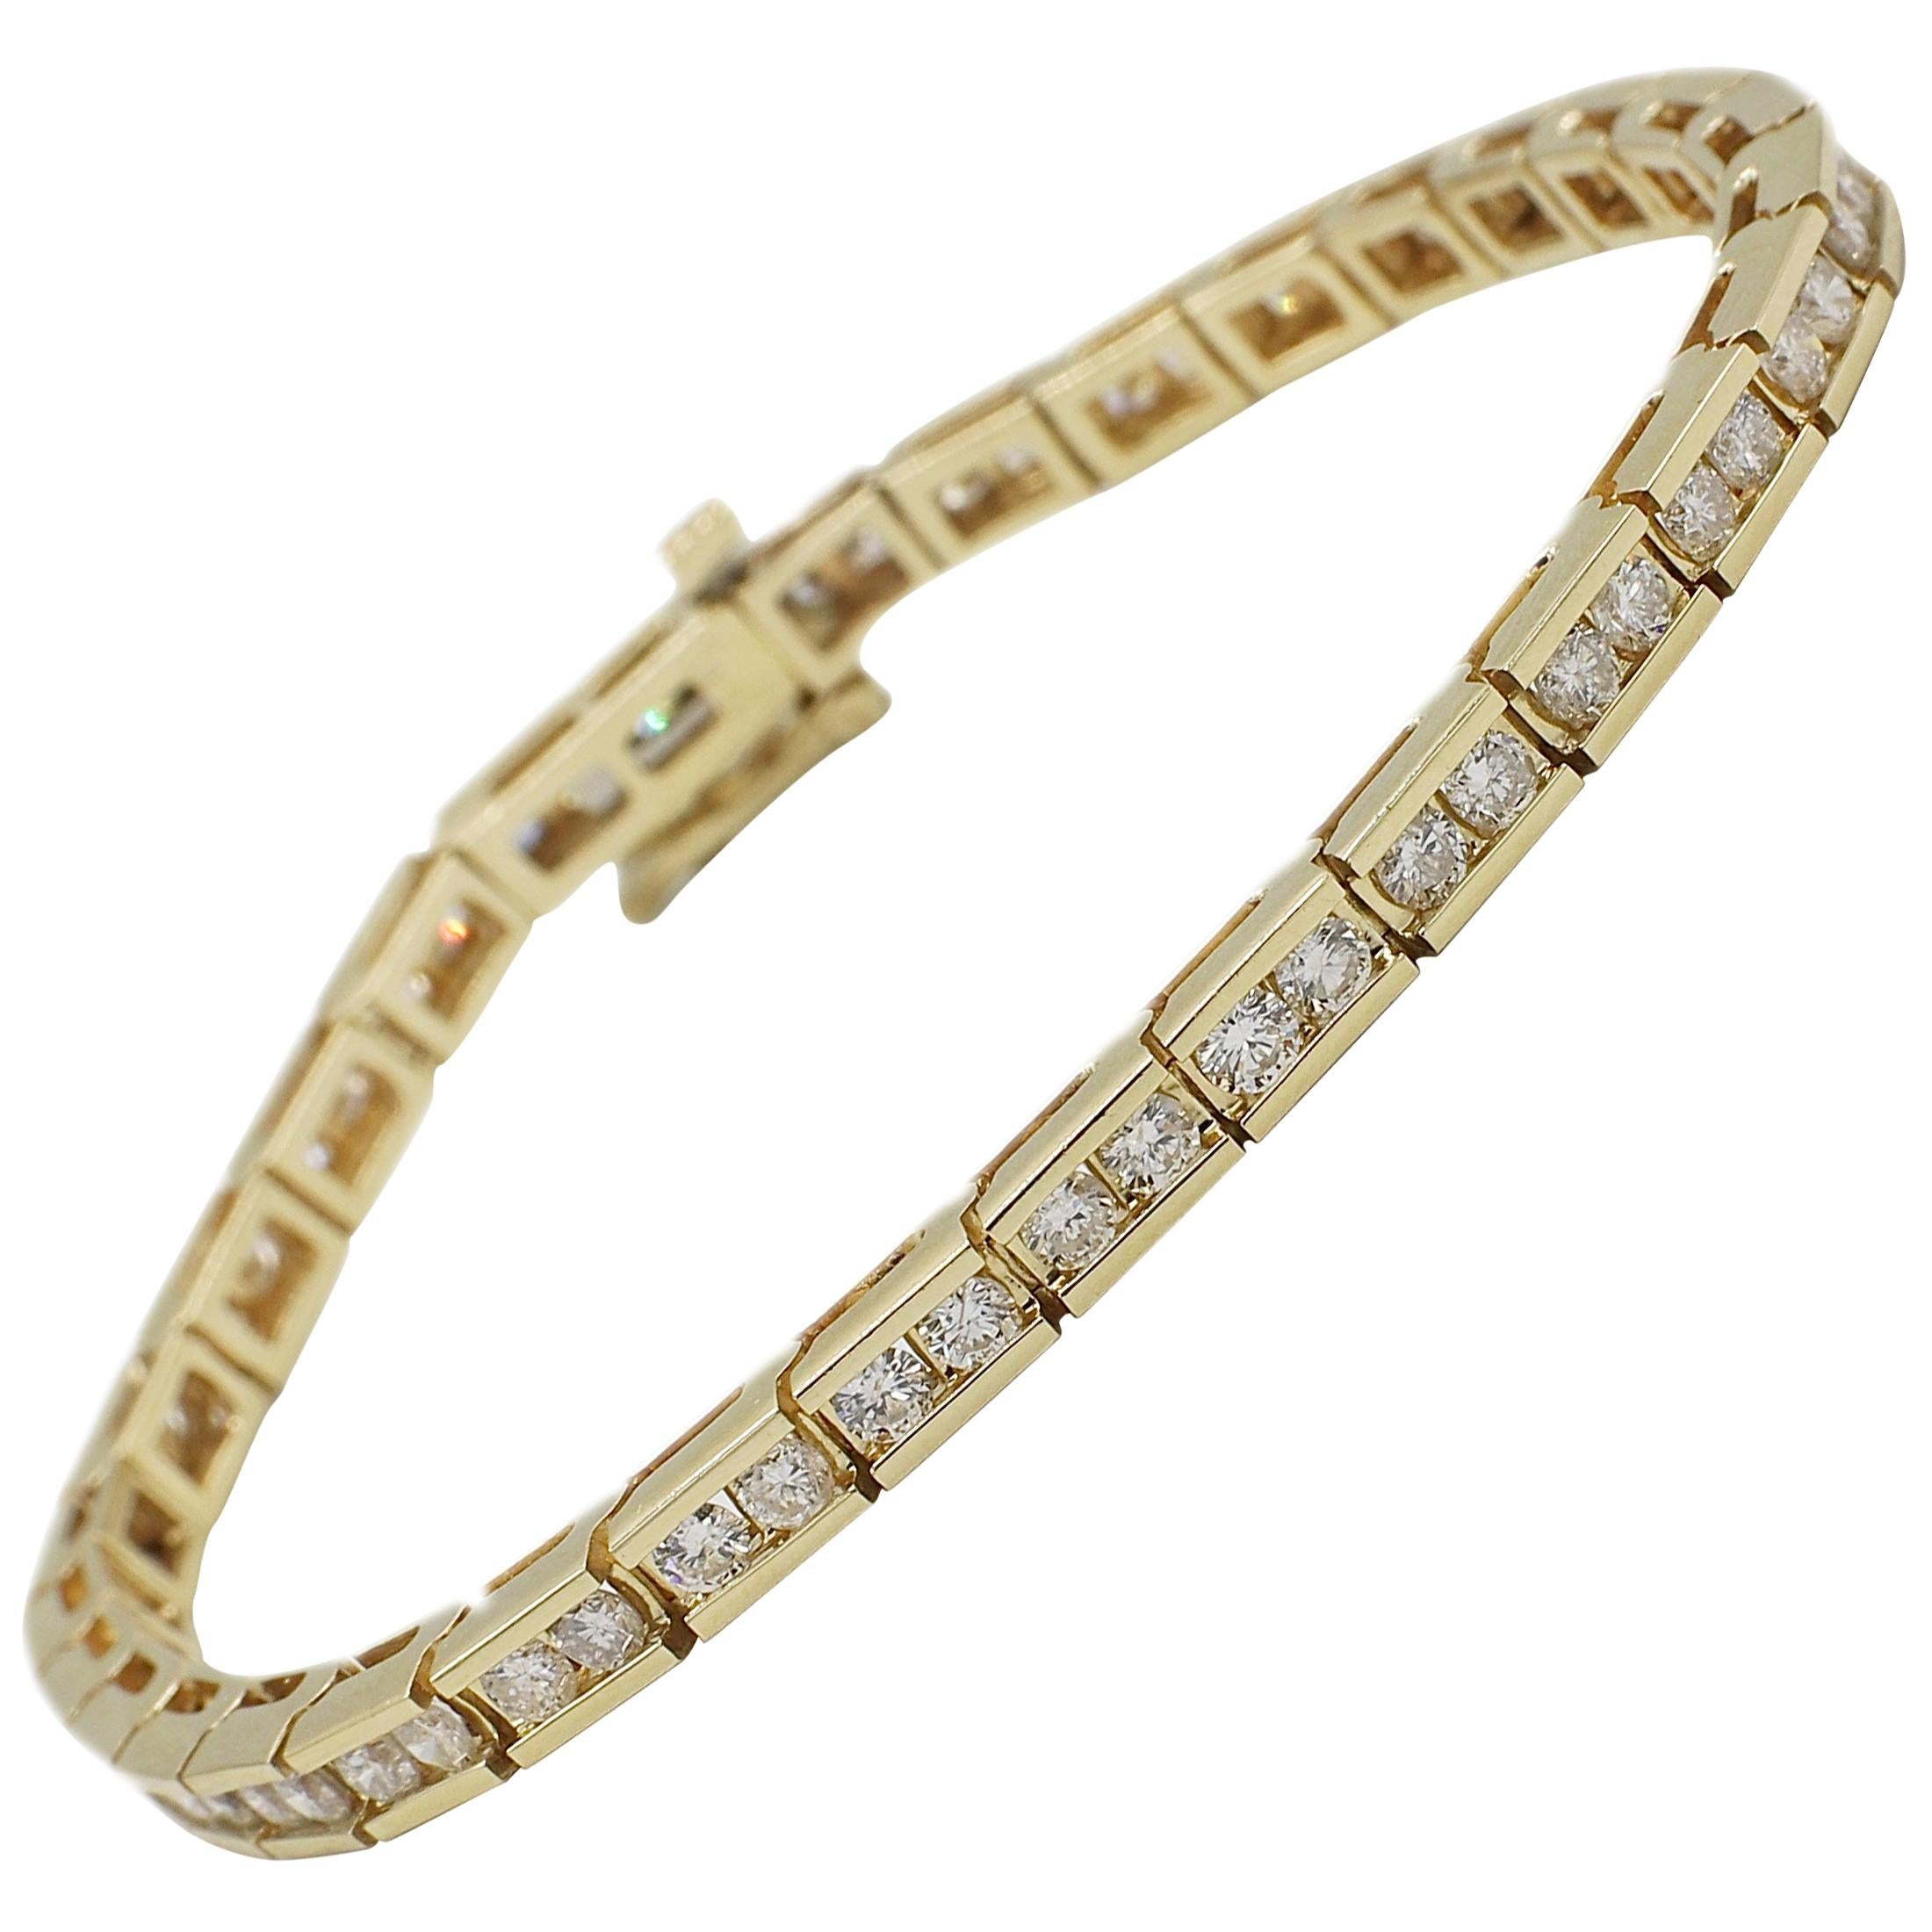 14 Karat Yellow Gold 3 Carat Diamond Tennis Bracelet